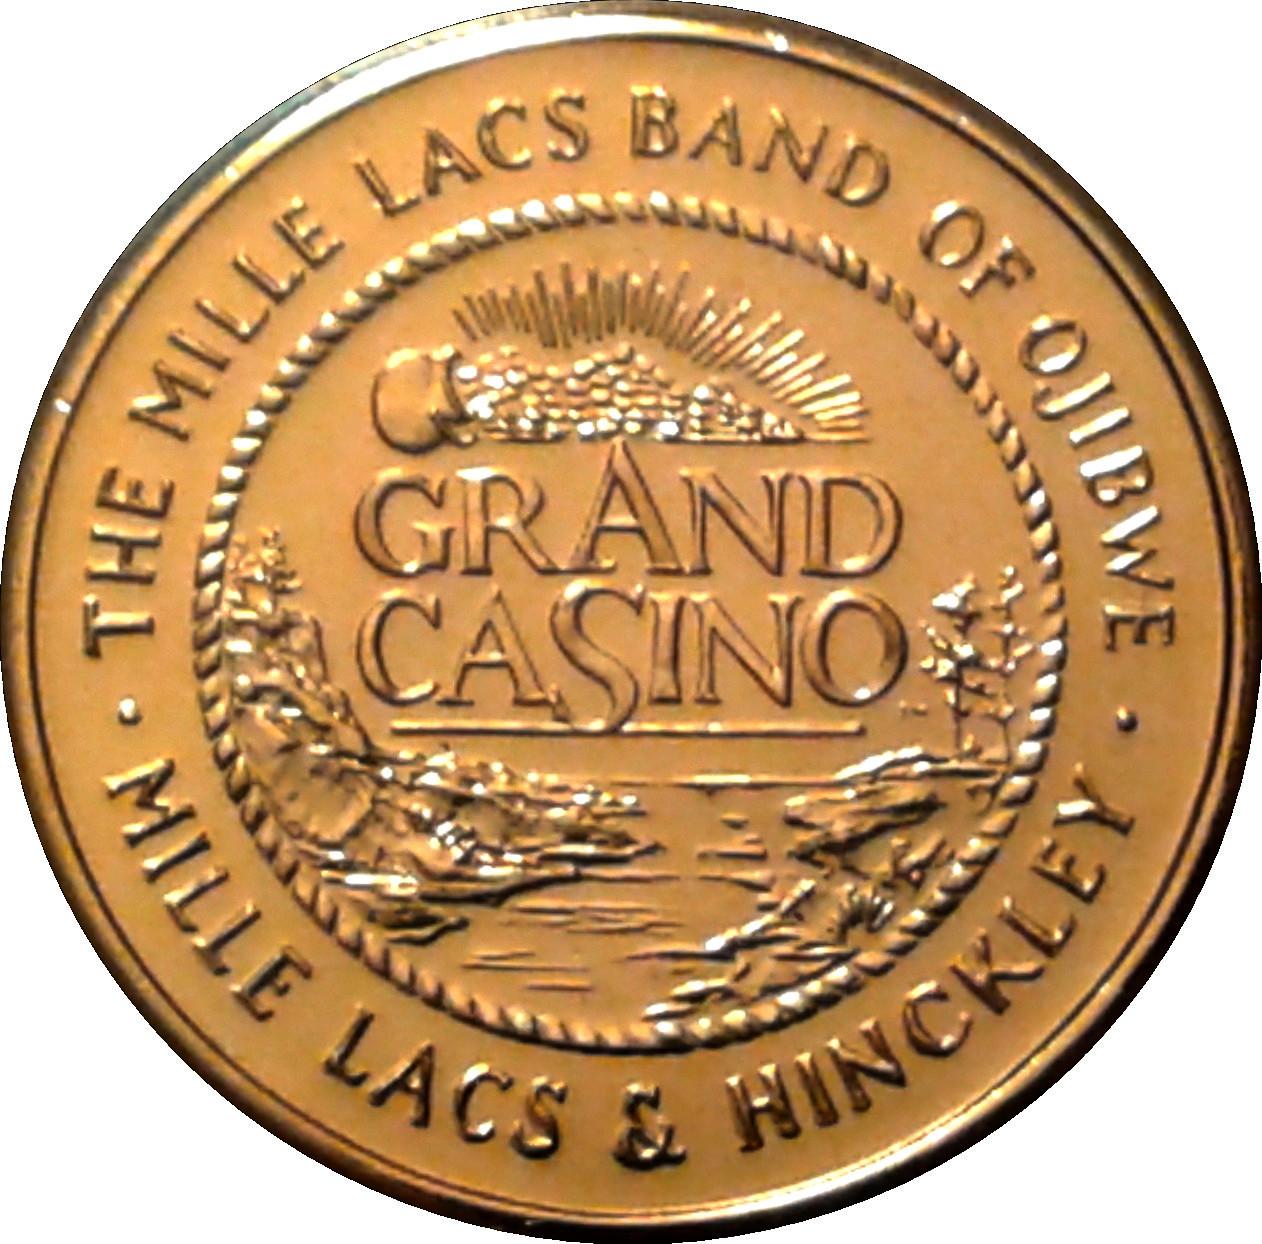 Grand casino hinckley gold coins casino hotel sam town